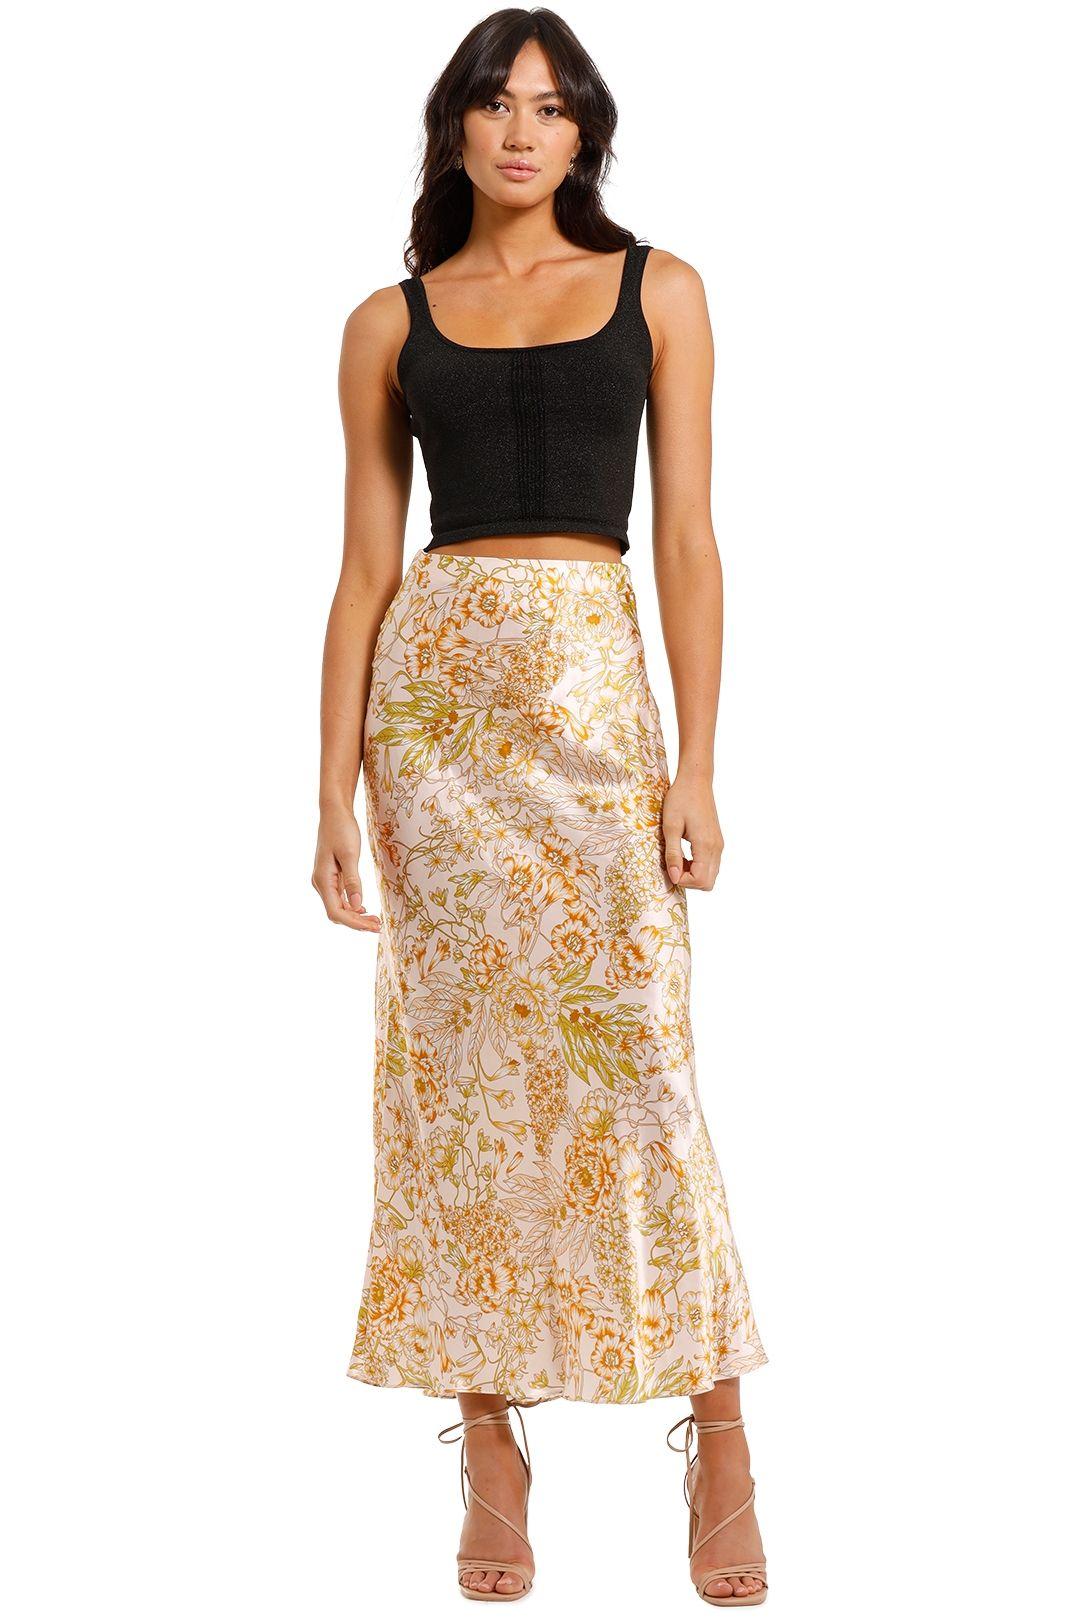 Bec and Bridge Floria Maxi Slip Skirt